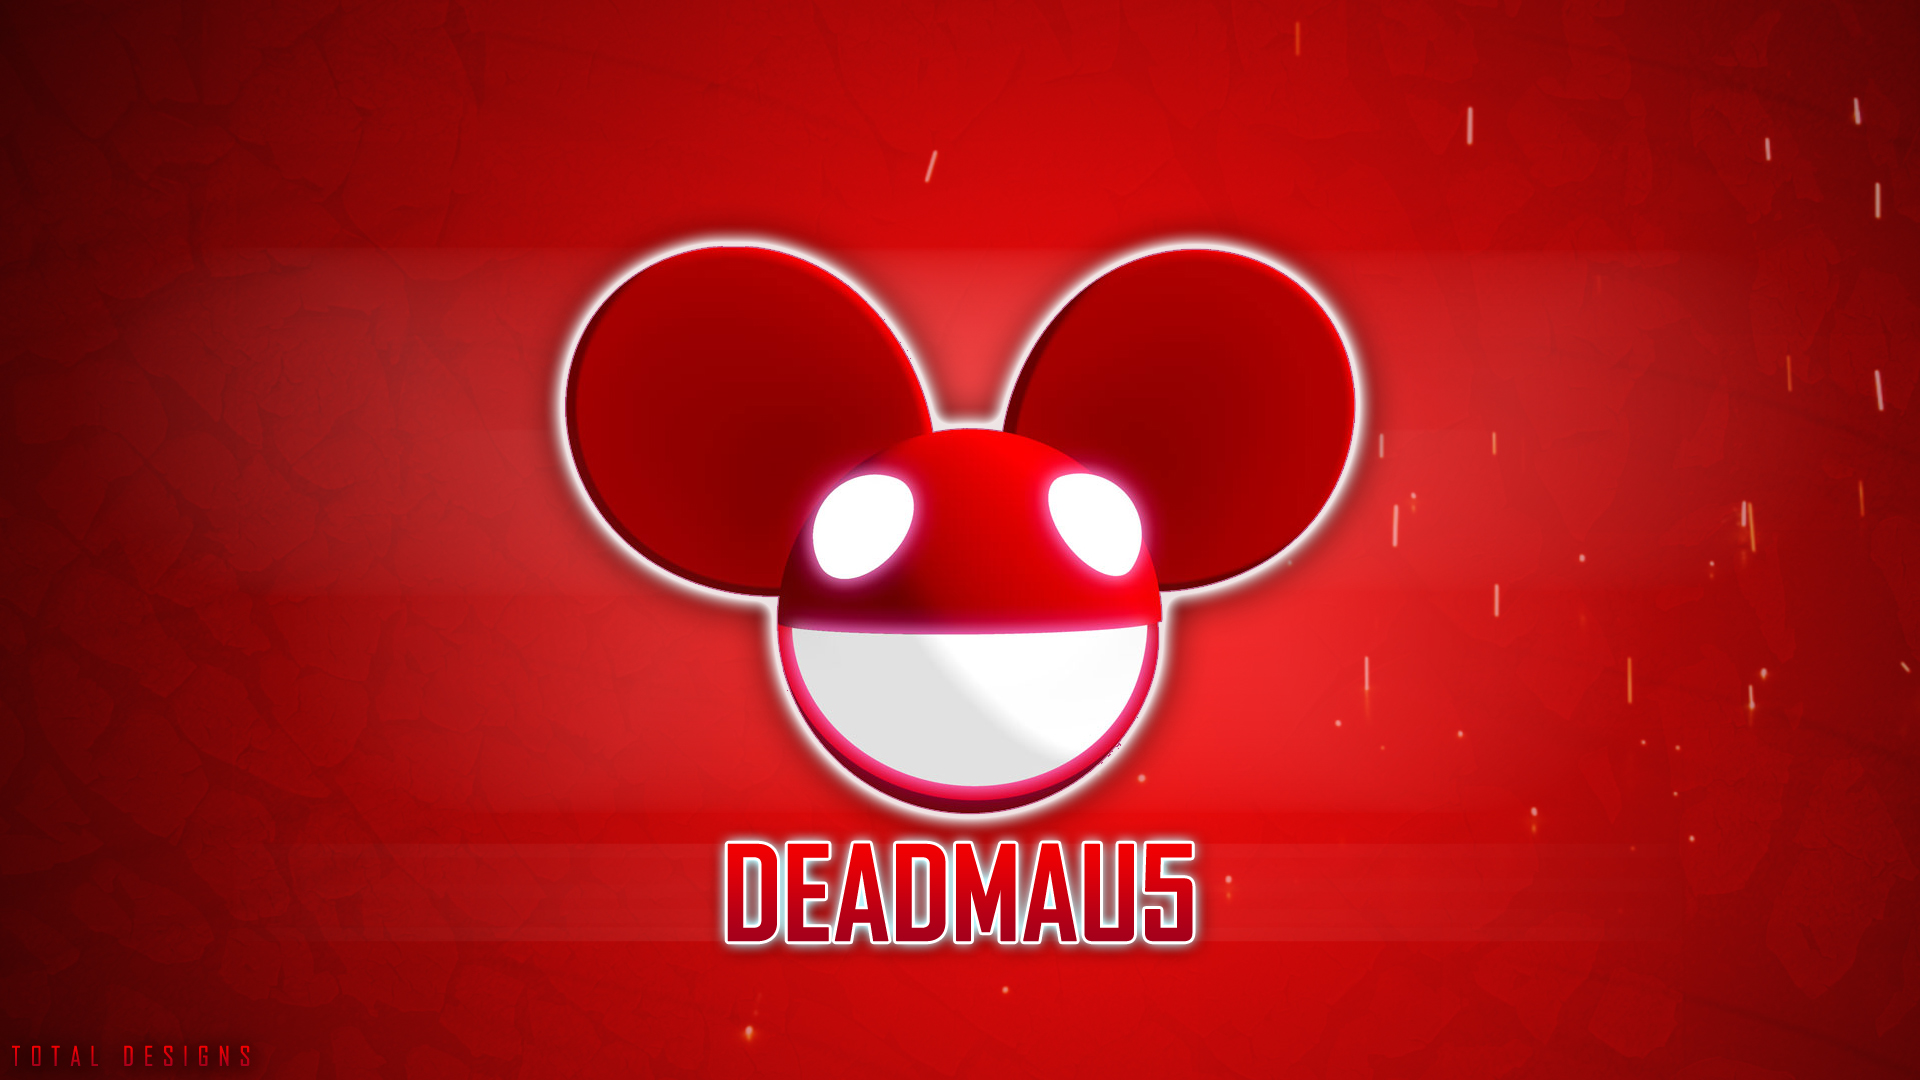 deadmau5_wallpaper_by_stechar05-d41y48o.jpg